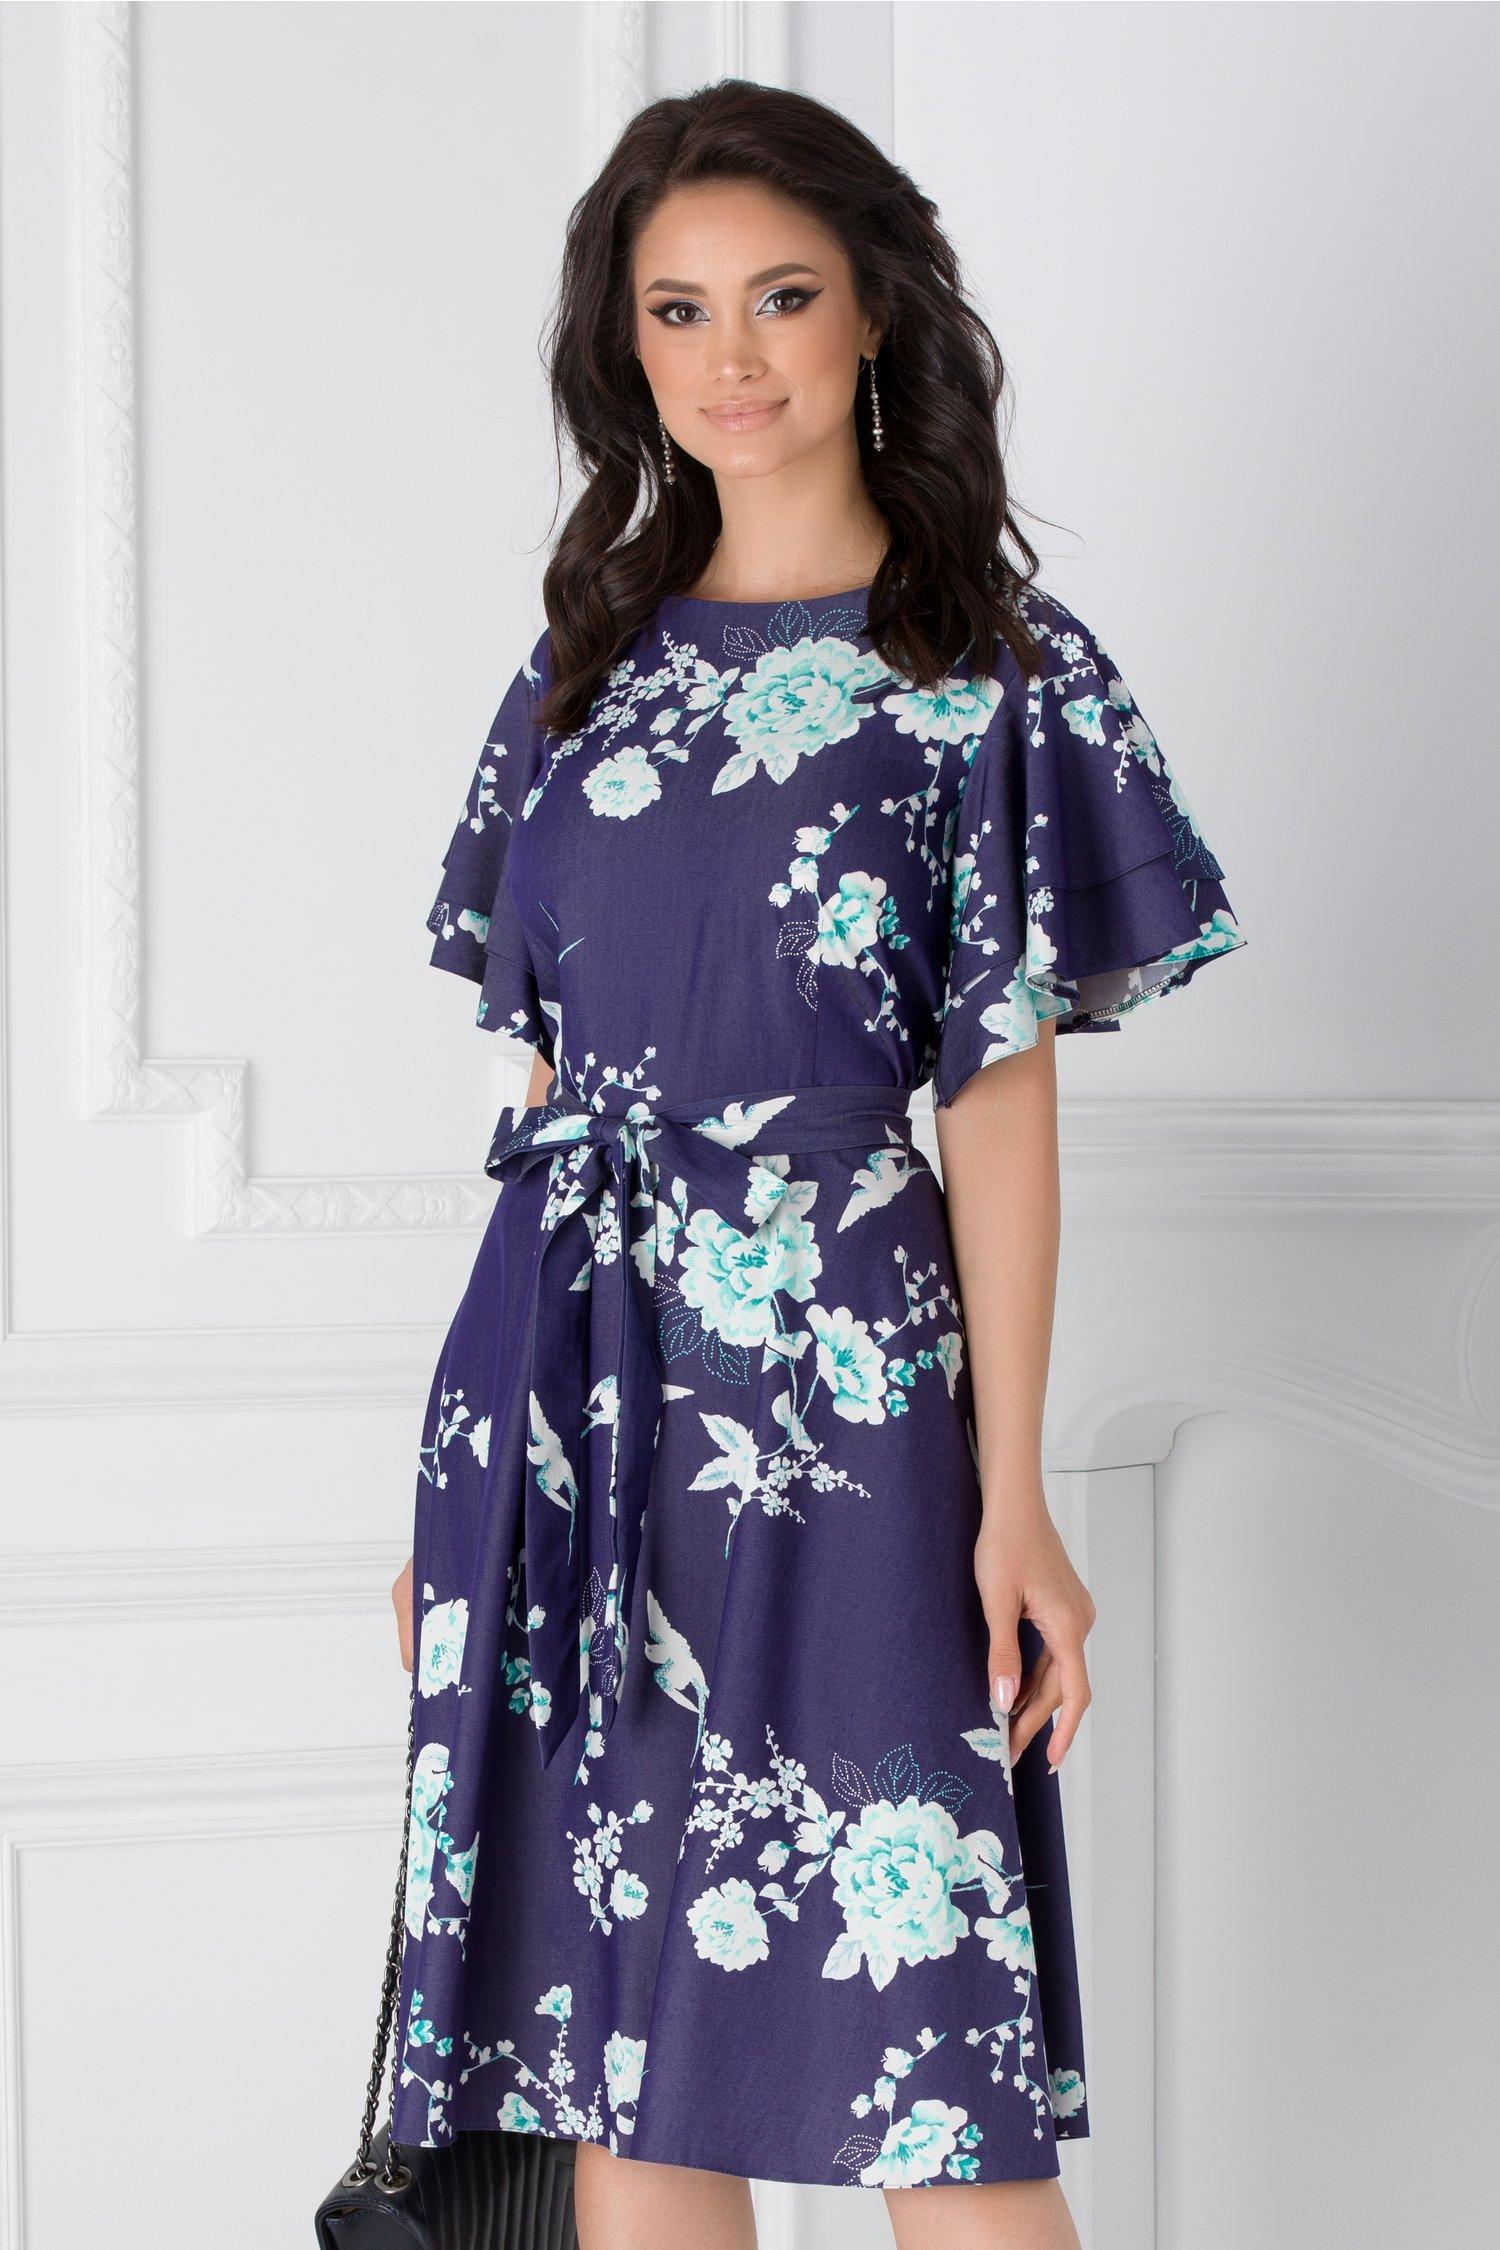 Rochie Sarry midi bleumarin cu imprimeuri florale verzi